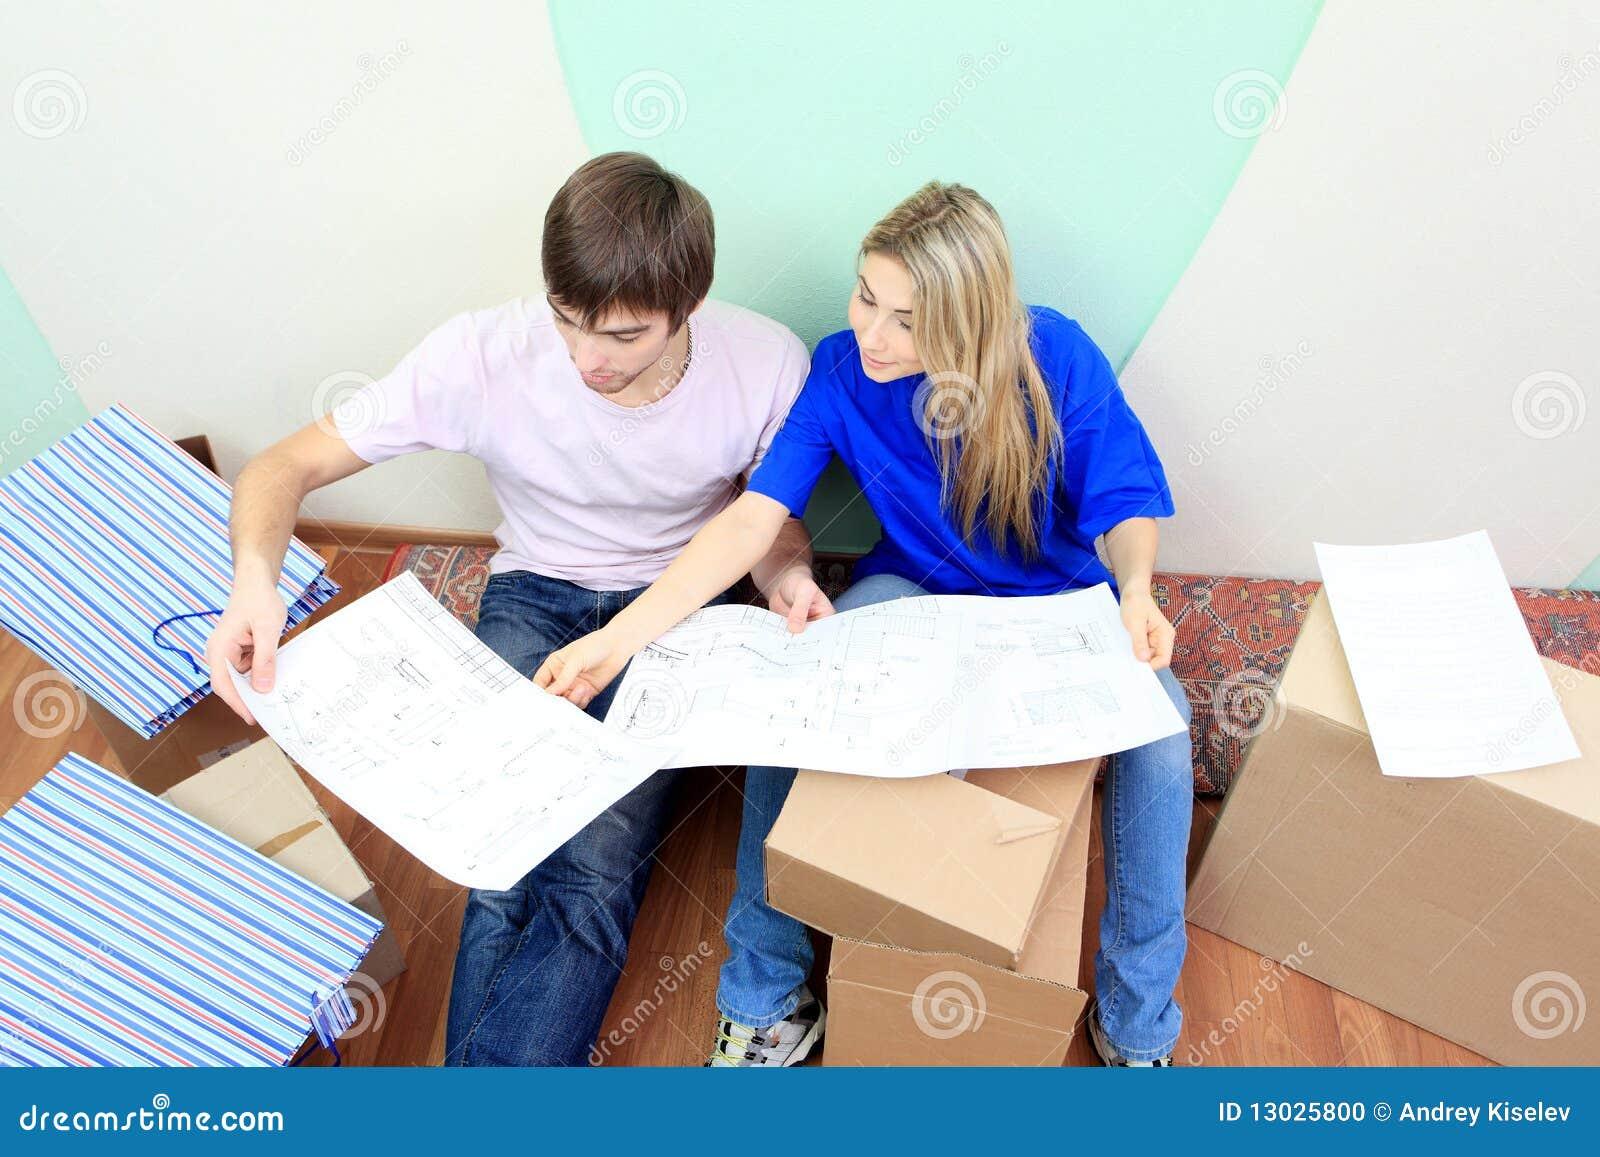 designing new home stock photo image 13025800